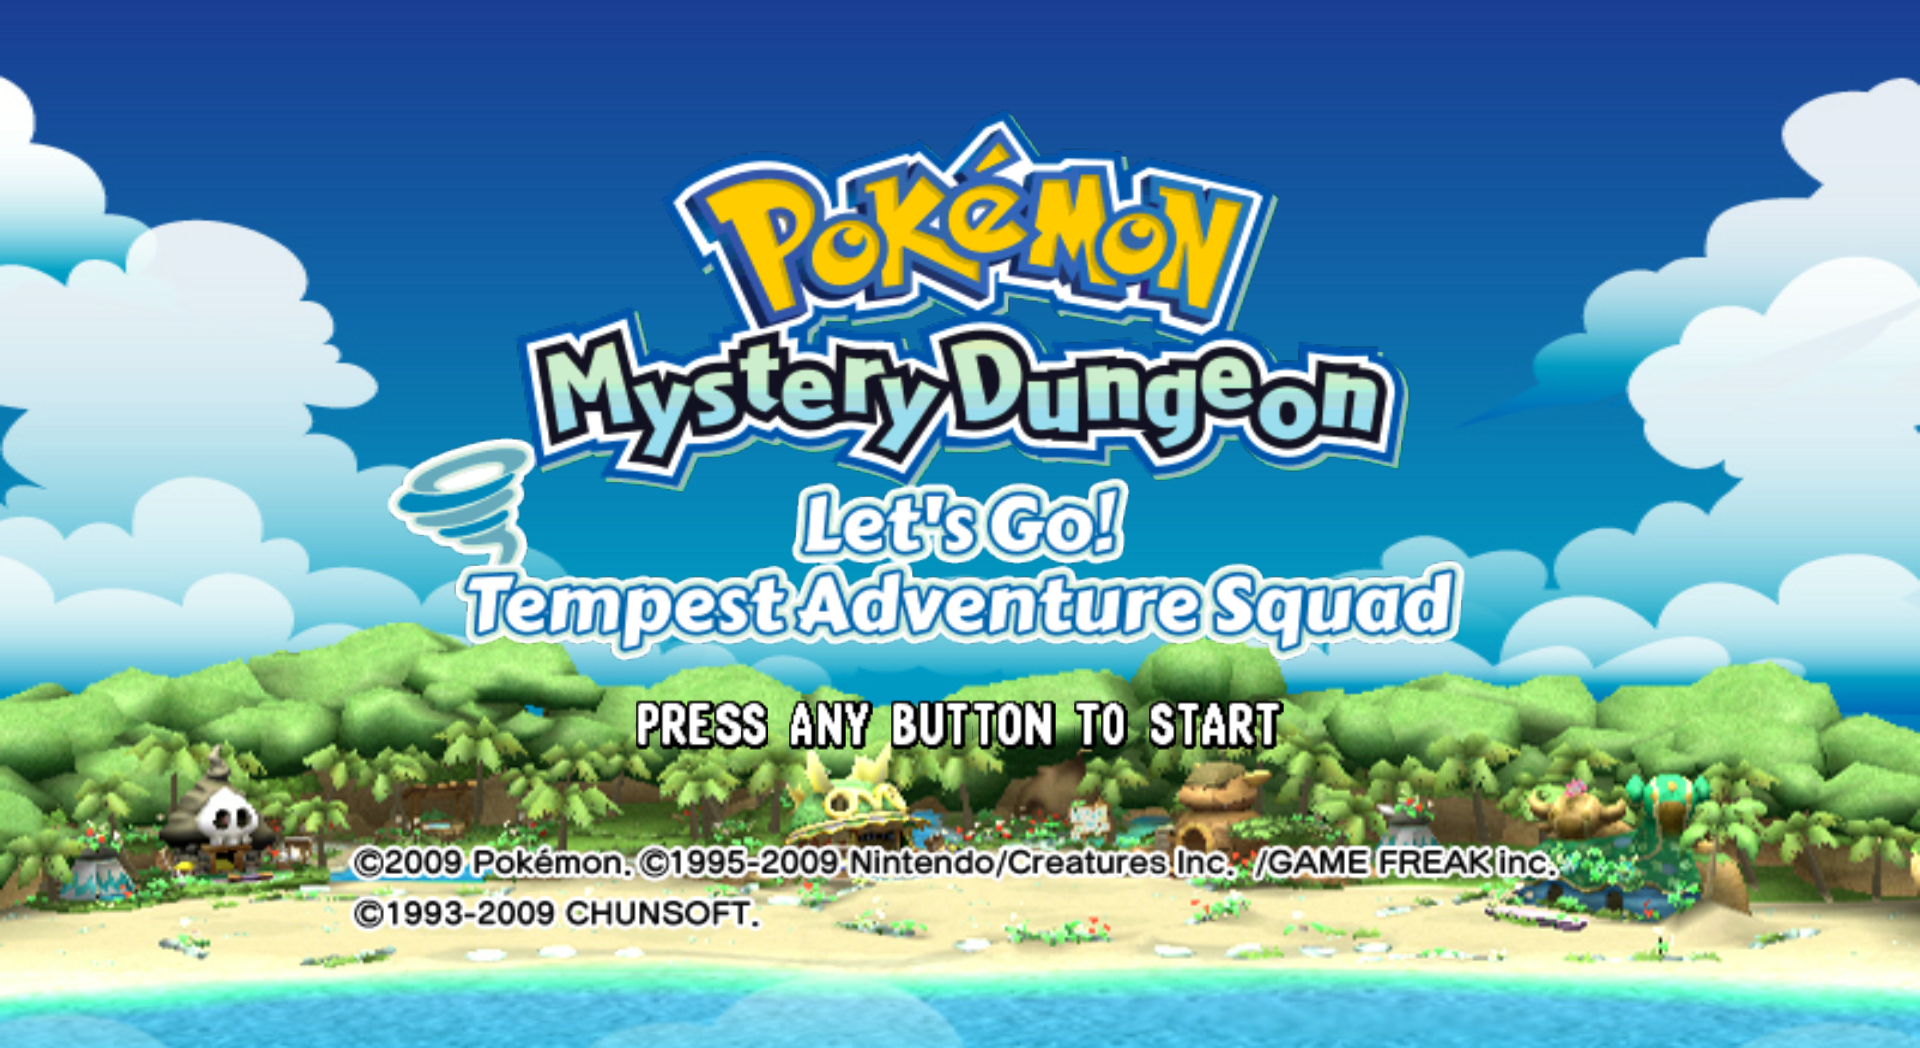 Descargar el ROM de Pokemon Fushigi no Dungeon - Ikuzo! Arashi no Boukendan